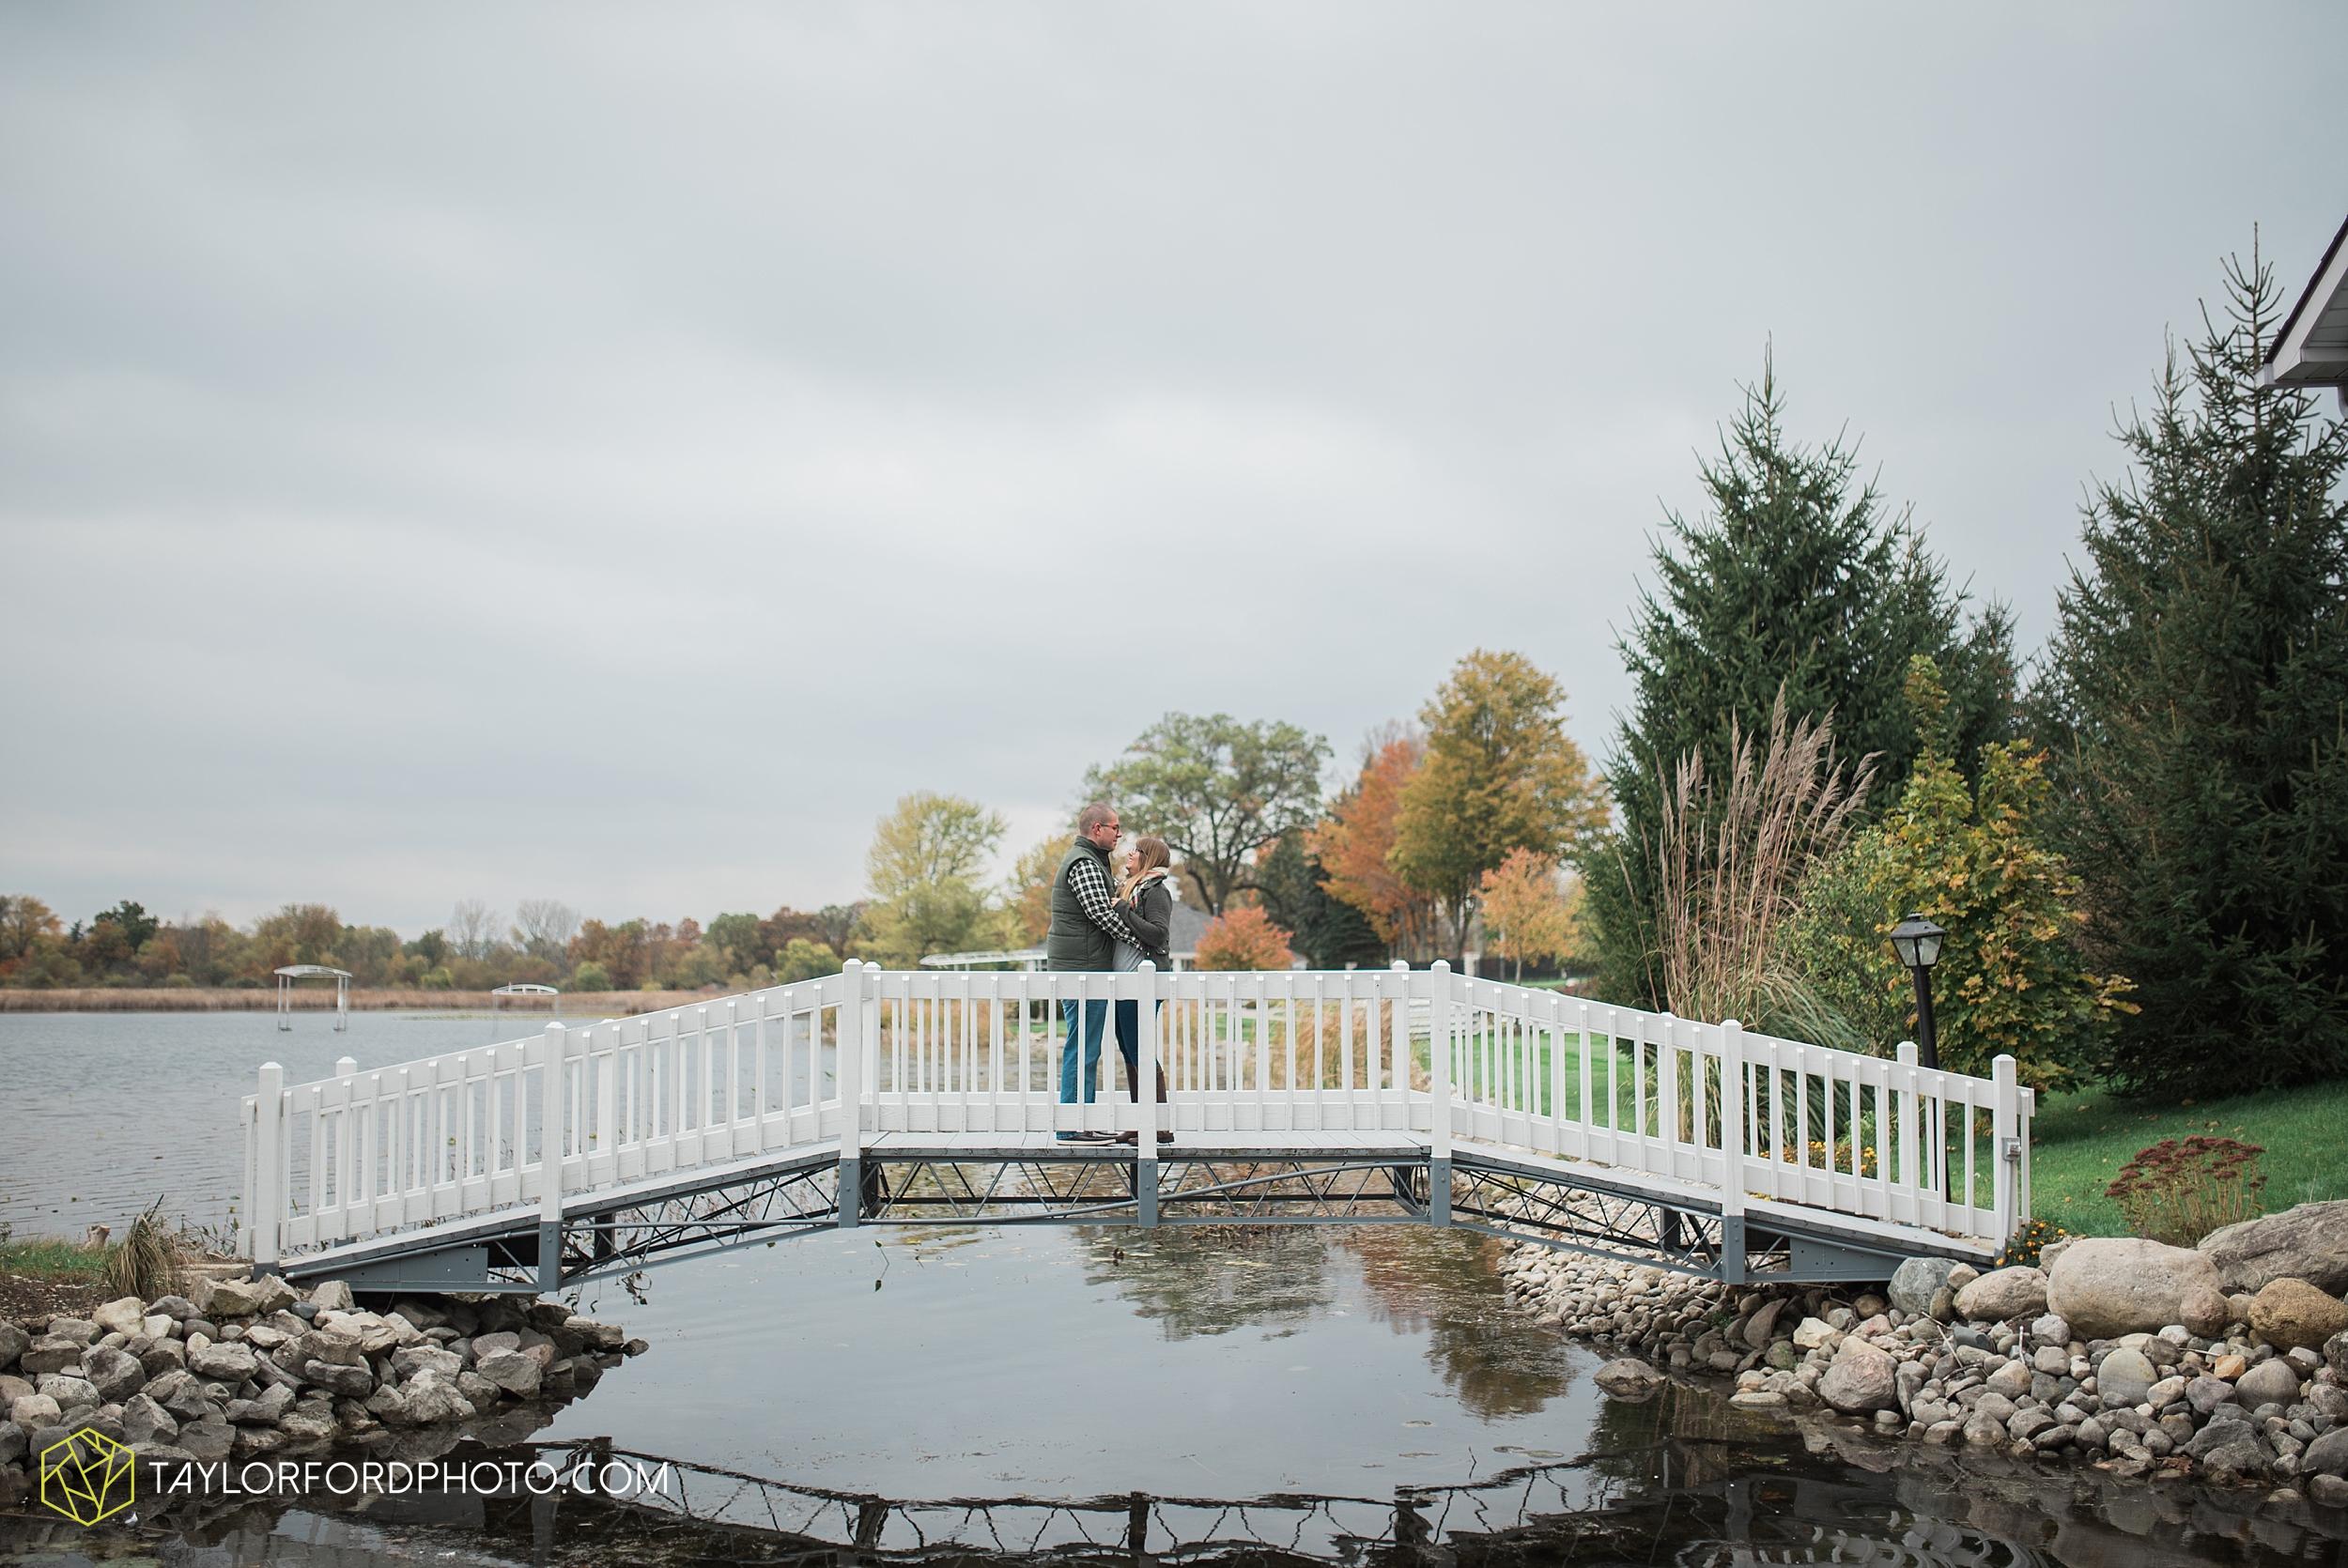 angola-indiana-crooked-lake-engagement-wedding-photographer-Taylor-Ford-Photography-winter-frozen-lake_4243.jpg